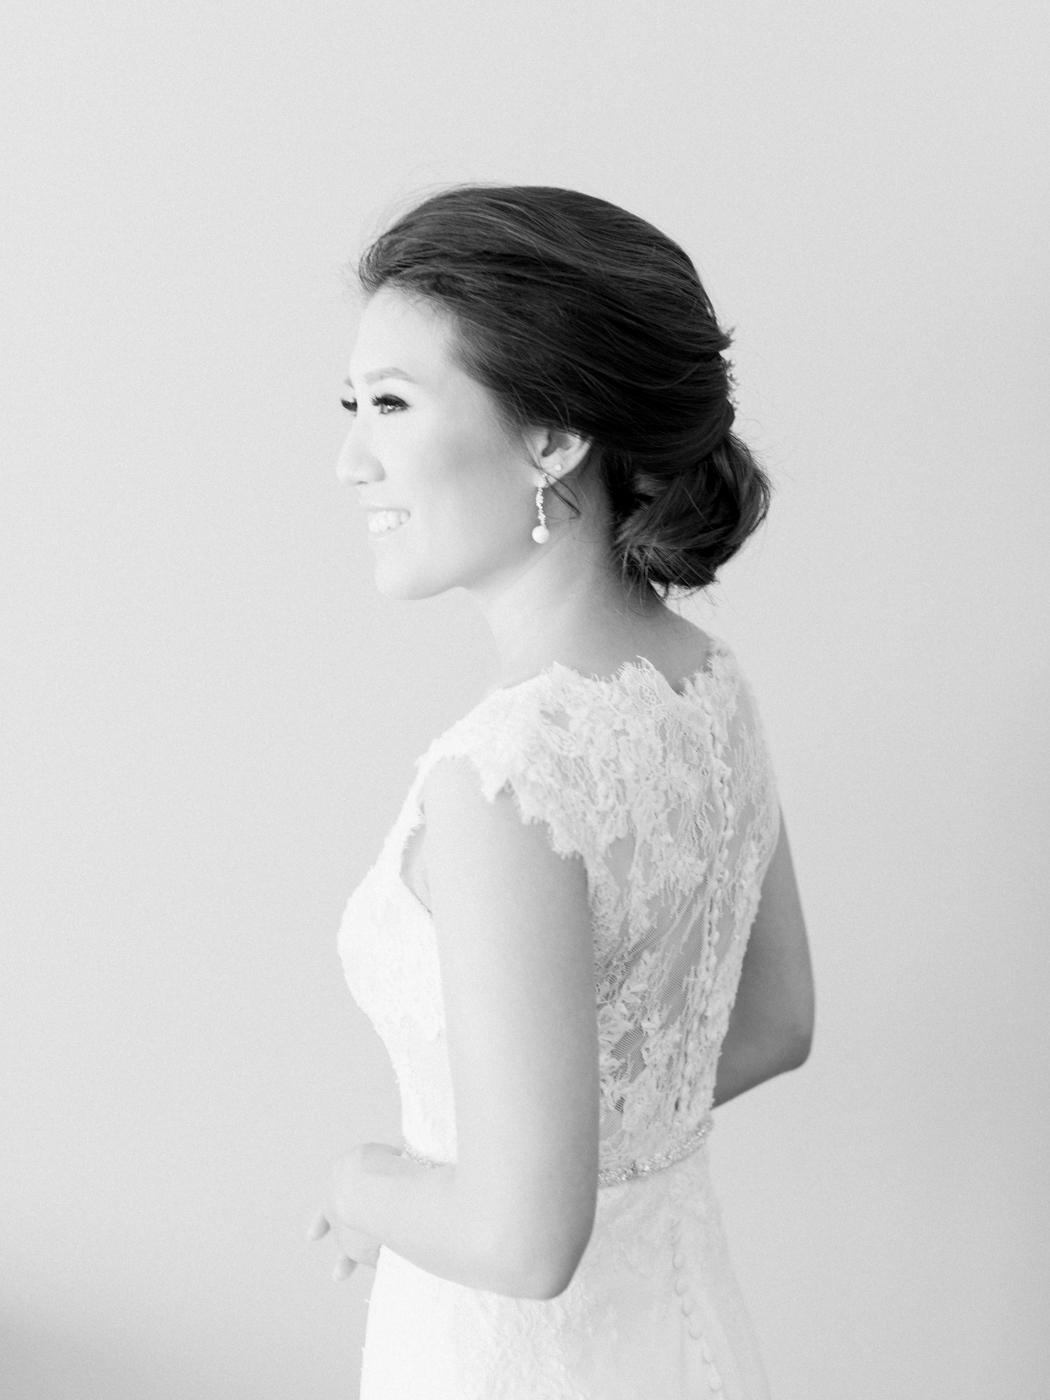 Modern_Wedding_HNYPT_Honeypot_LA_Photographer_Los_Angeles-3.jpg